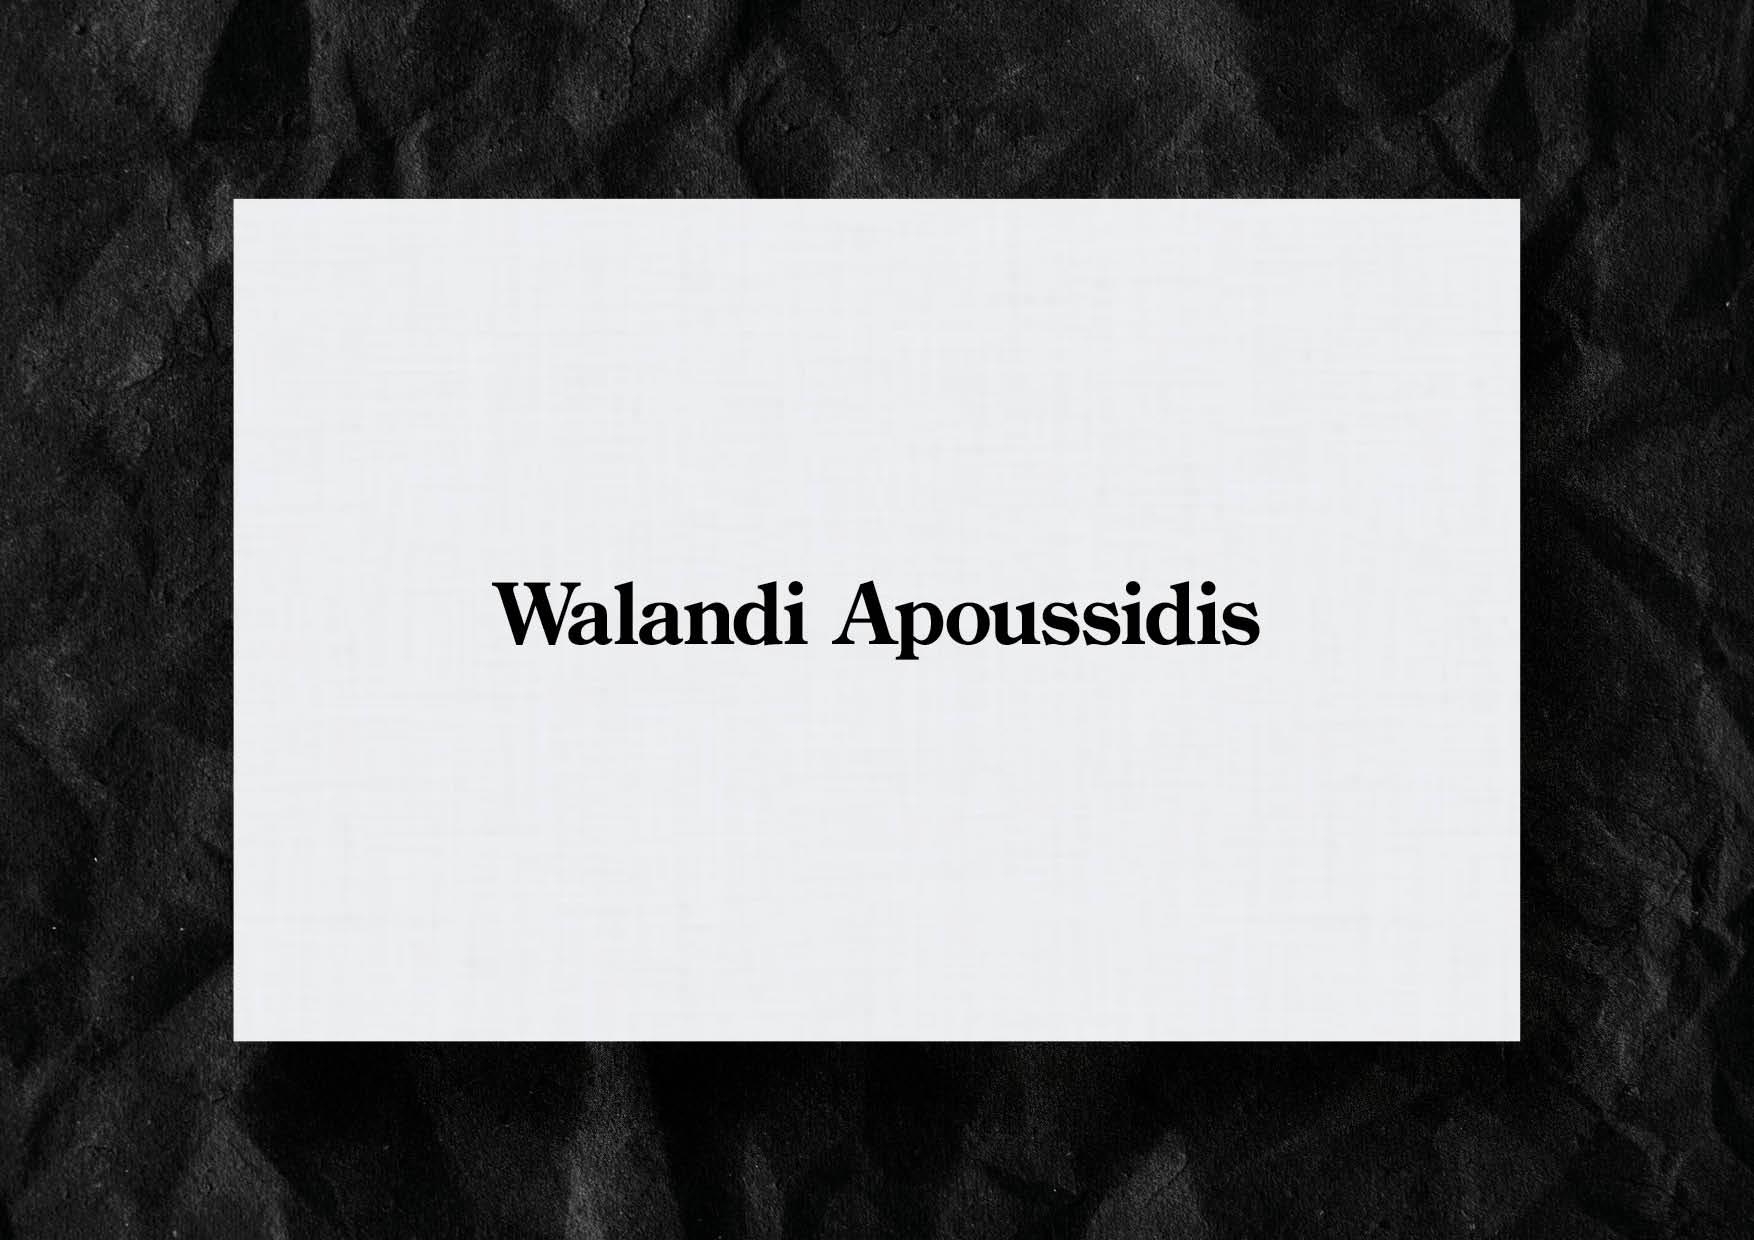 nicoletta-dalfino-walandi-apoussidis-business-card-front